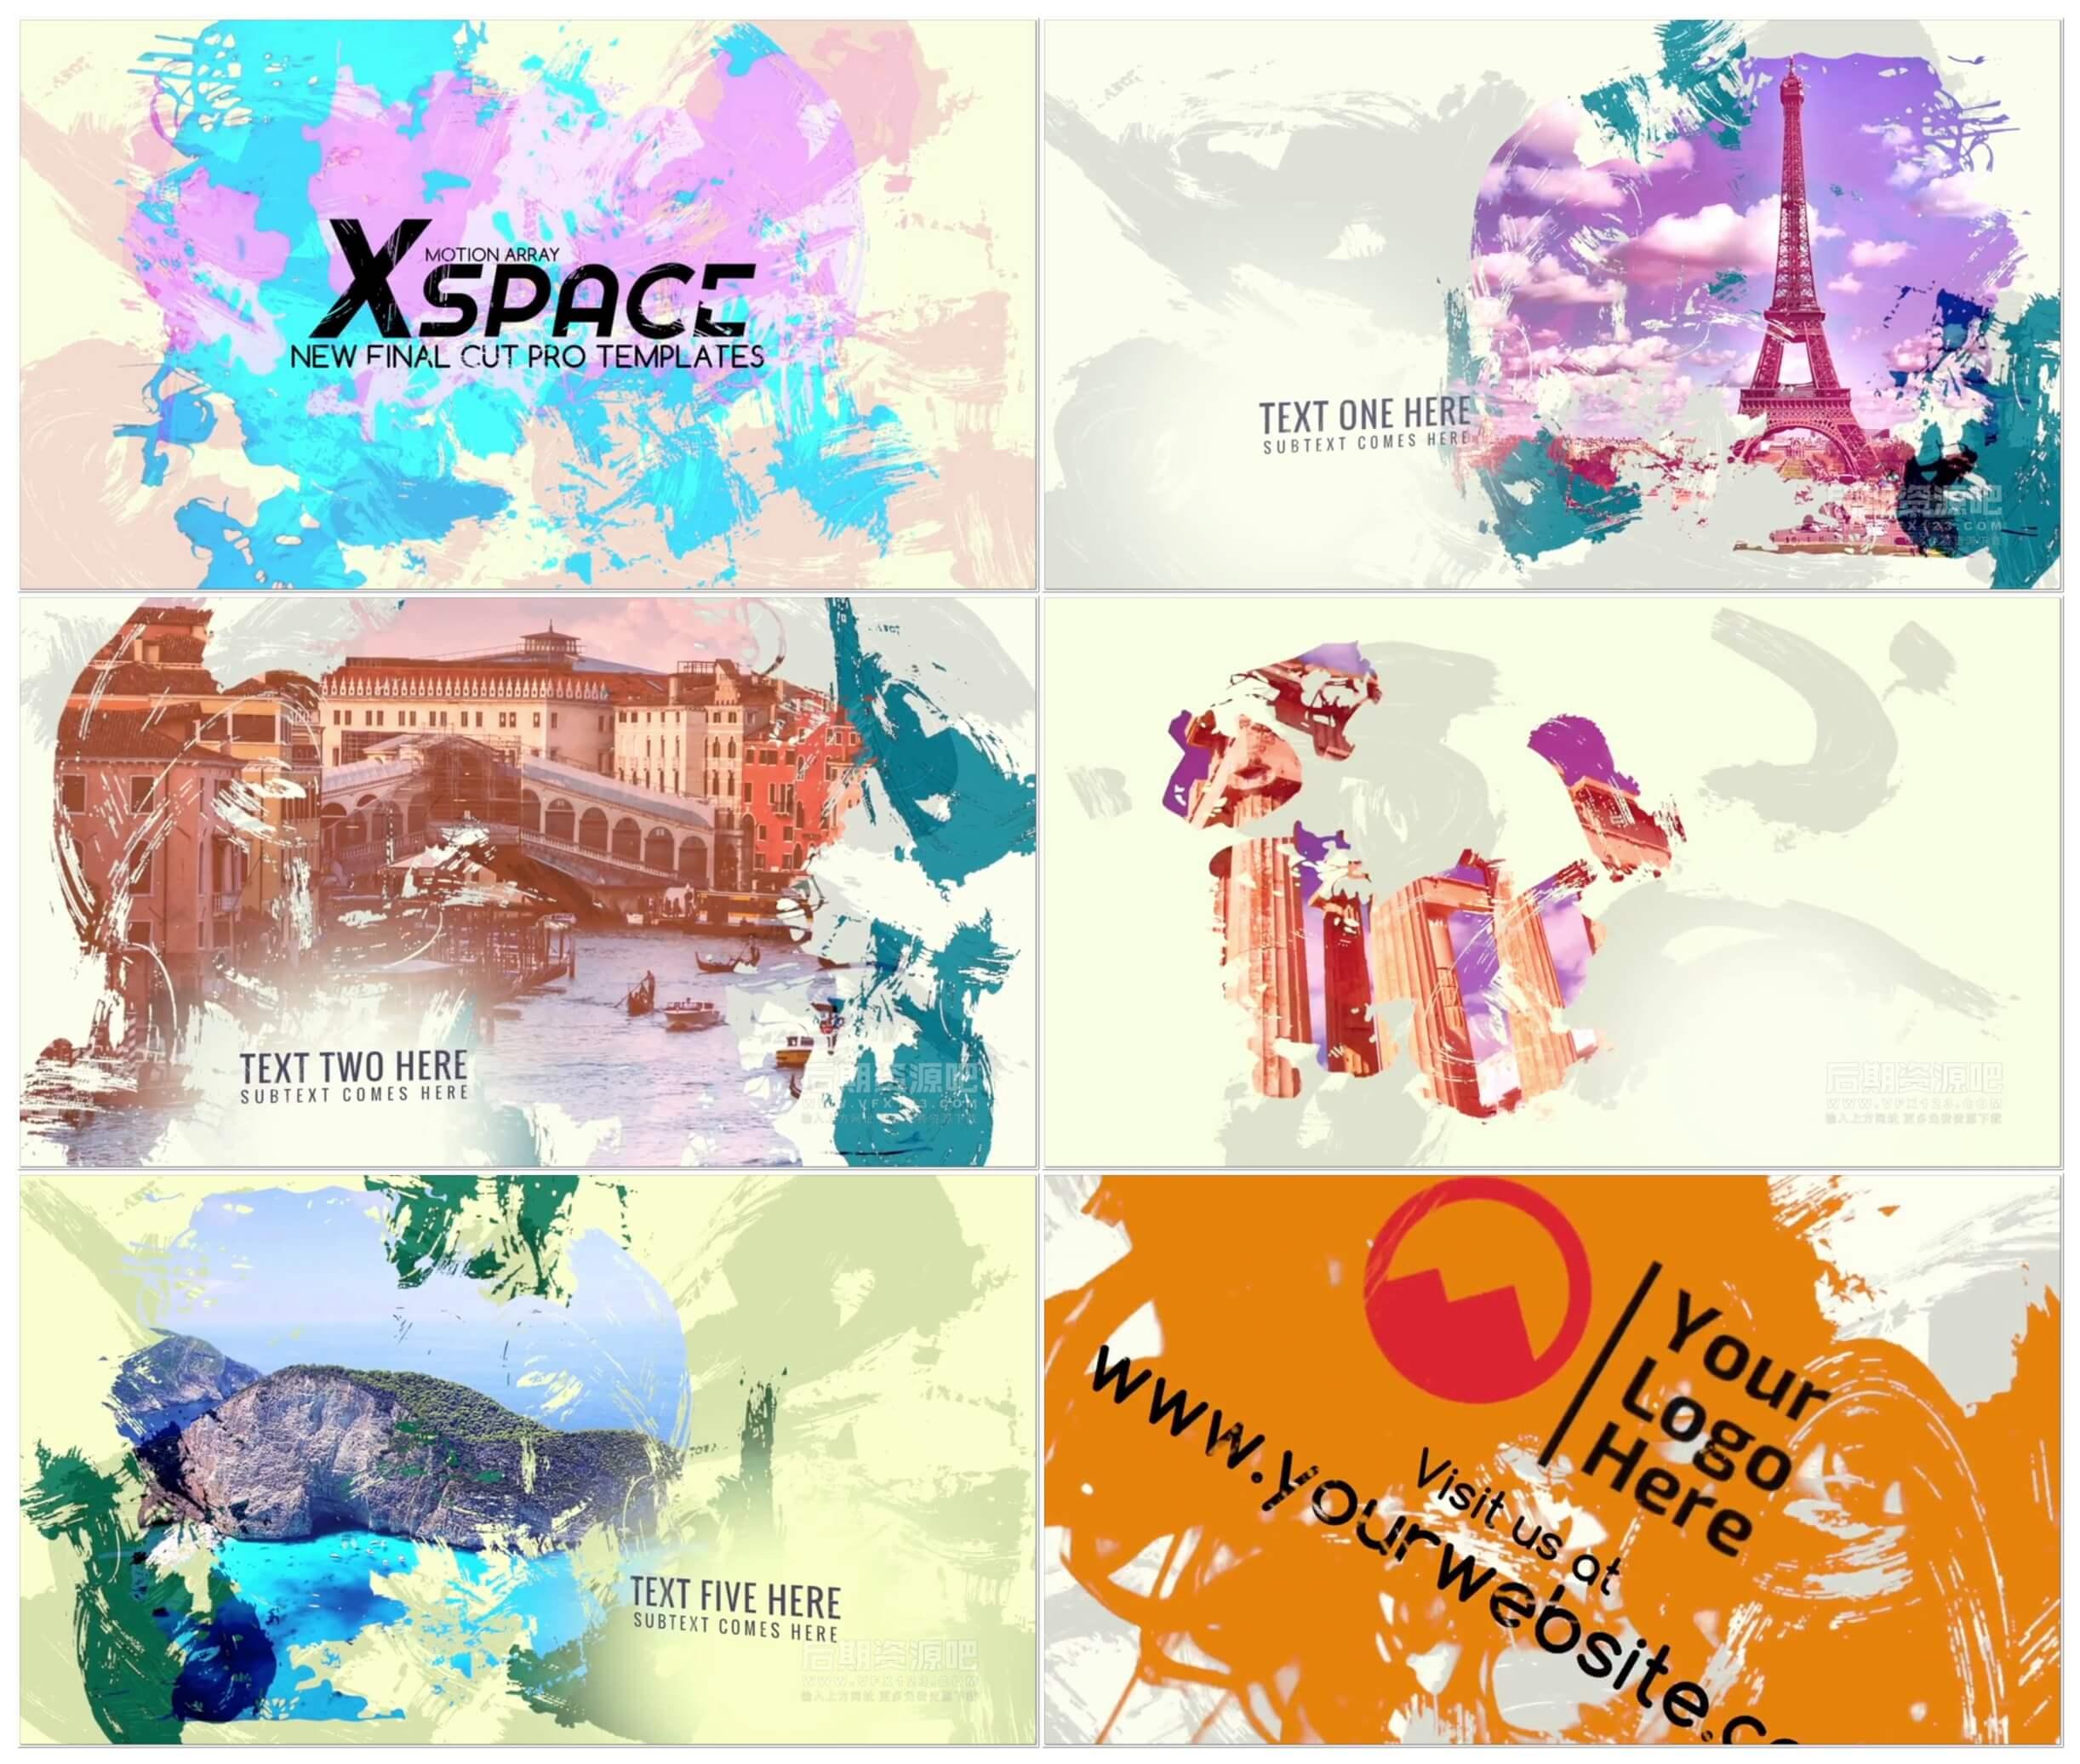 fcpx插件 涂抹笔刷过渡效果图文展示片头模板 Paint Slideshow